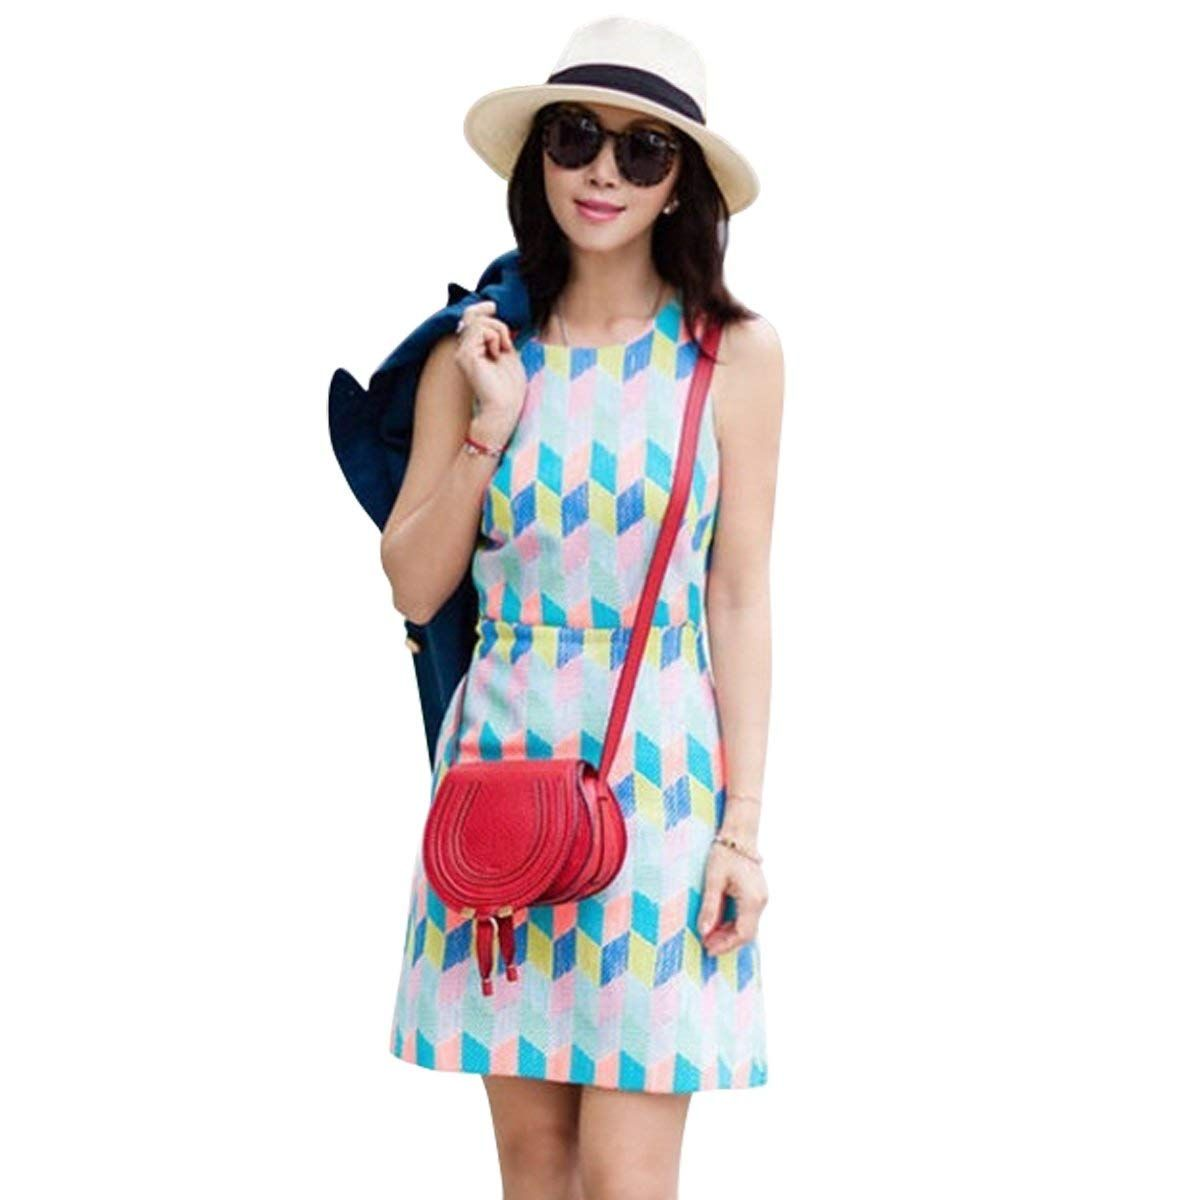 c4189ce0efcd0 Lanzom Women Wide Brim Straw Panama Roll up Hat Fedora Beach Sun Hat UPF50+  (Black) at Amazon Women s Clothing store